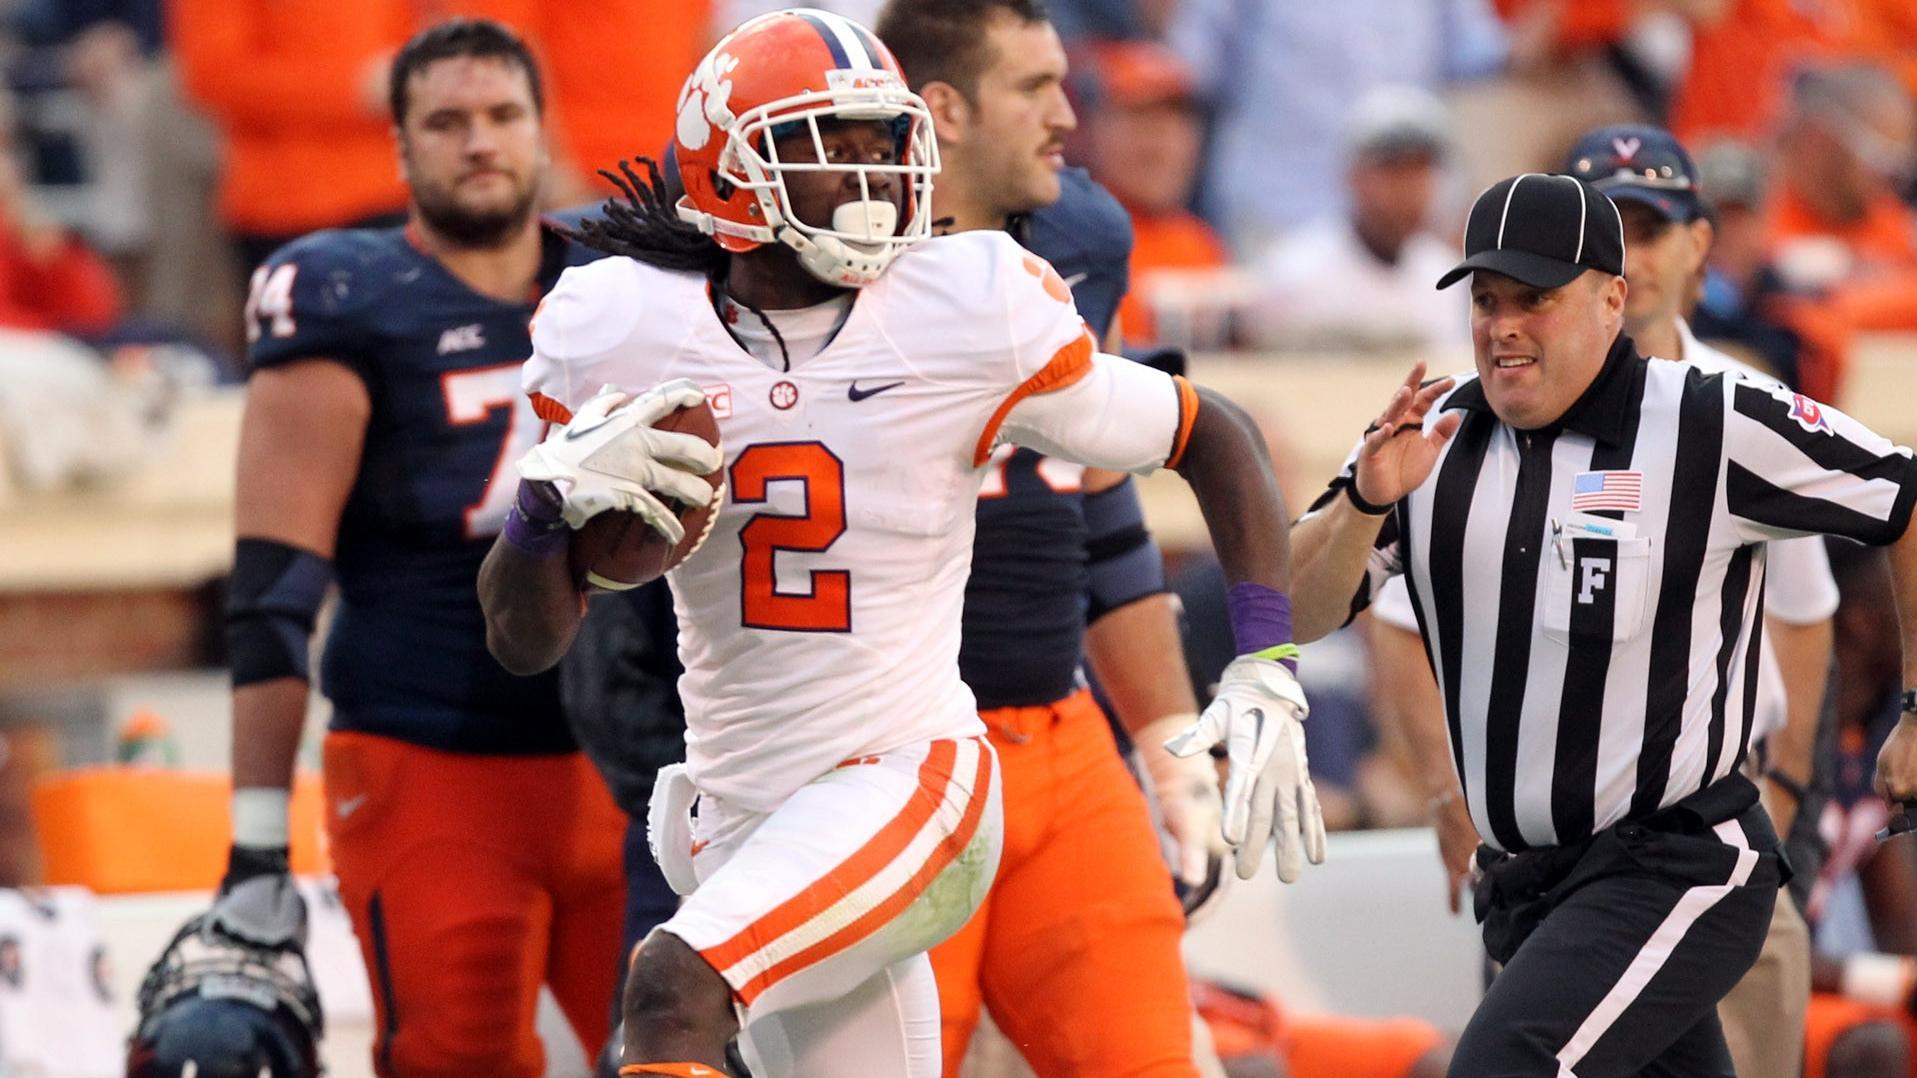 Watkins' Big Plays Help Tigers Roll at Virginia